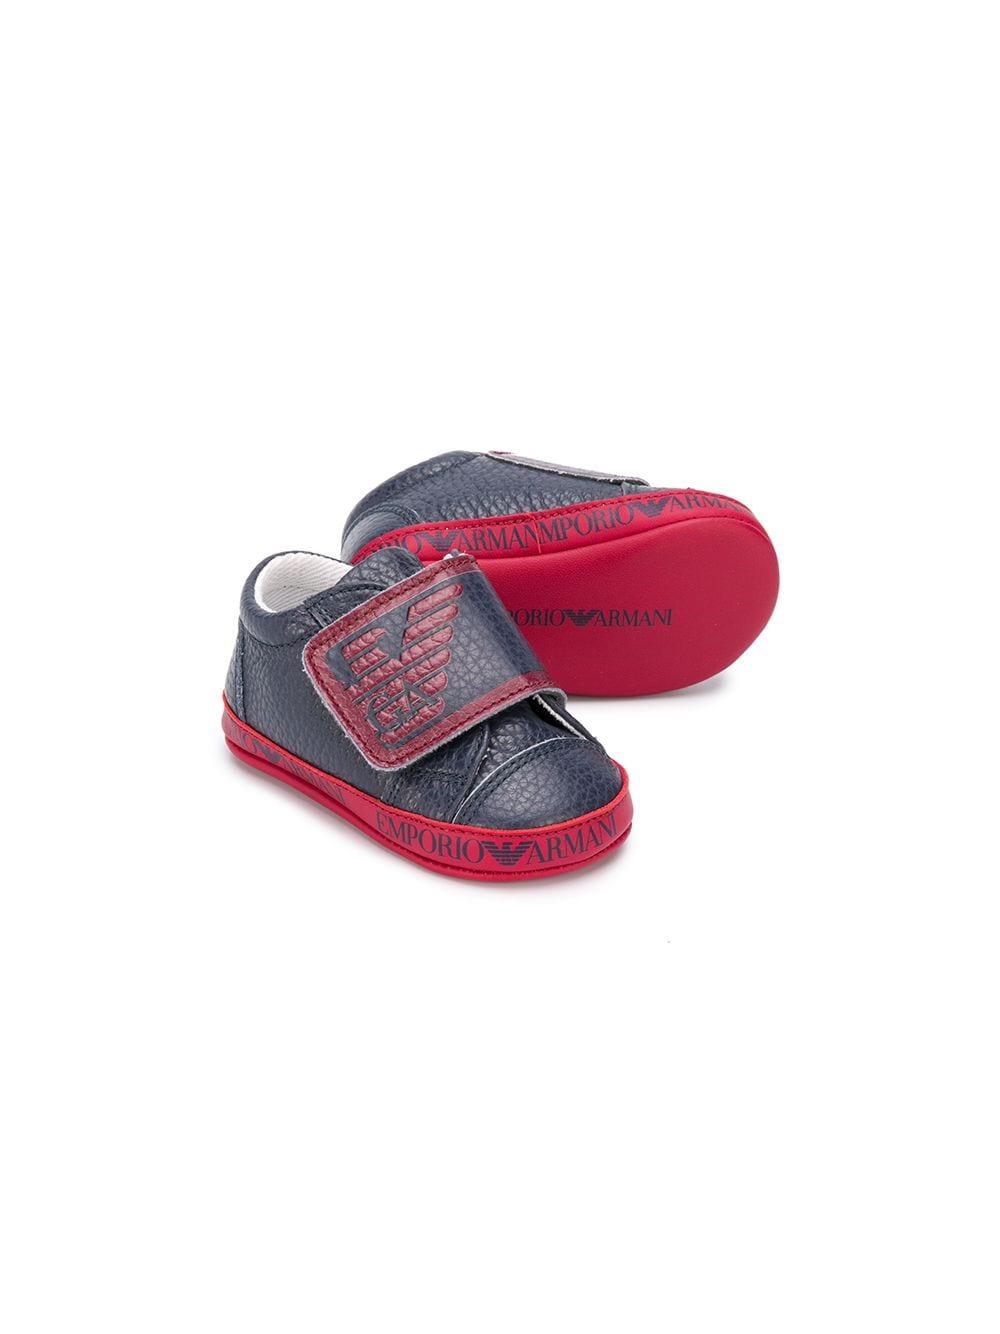 GIORGIO ARMANI KIDS | Sneaker | XLX003XOB05N213